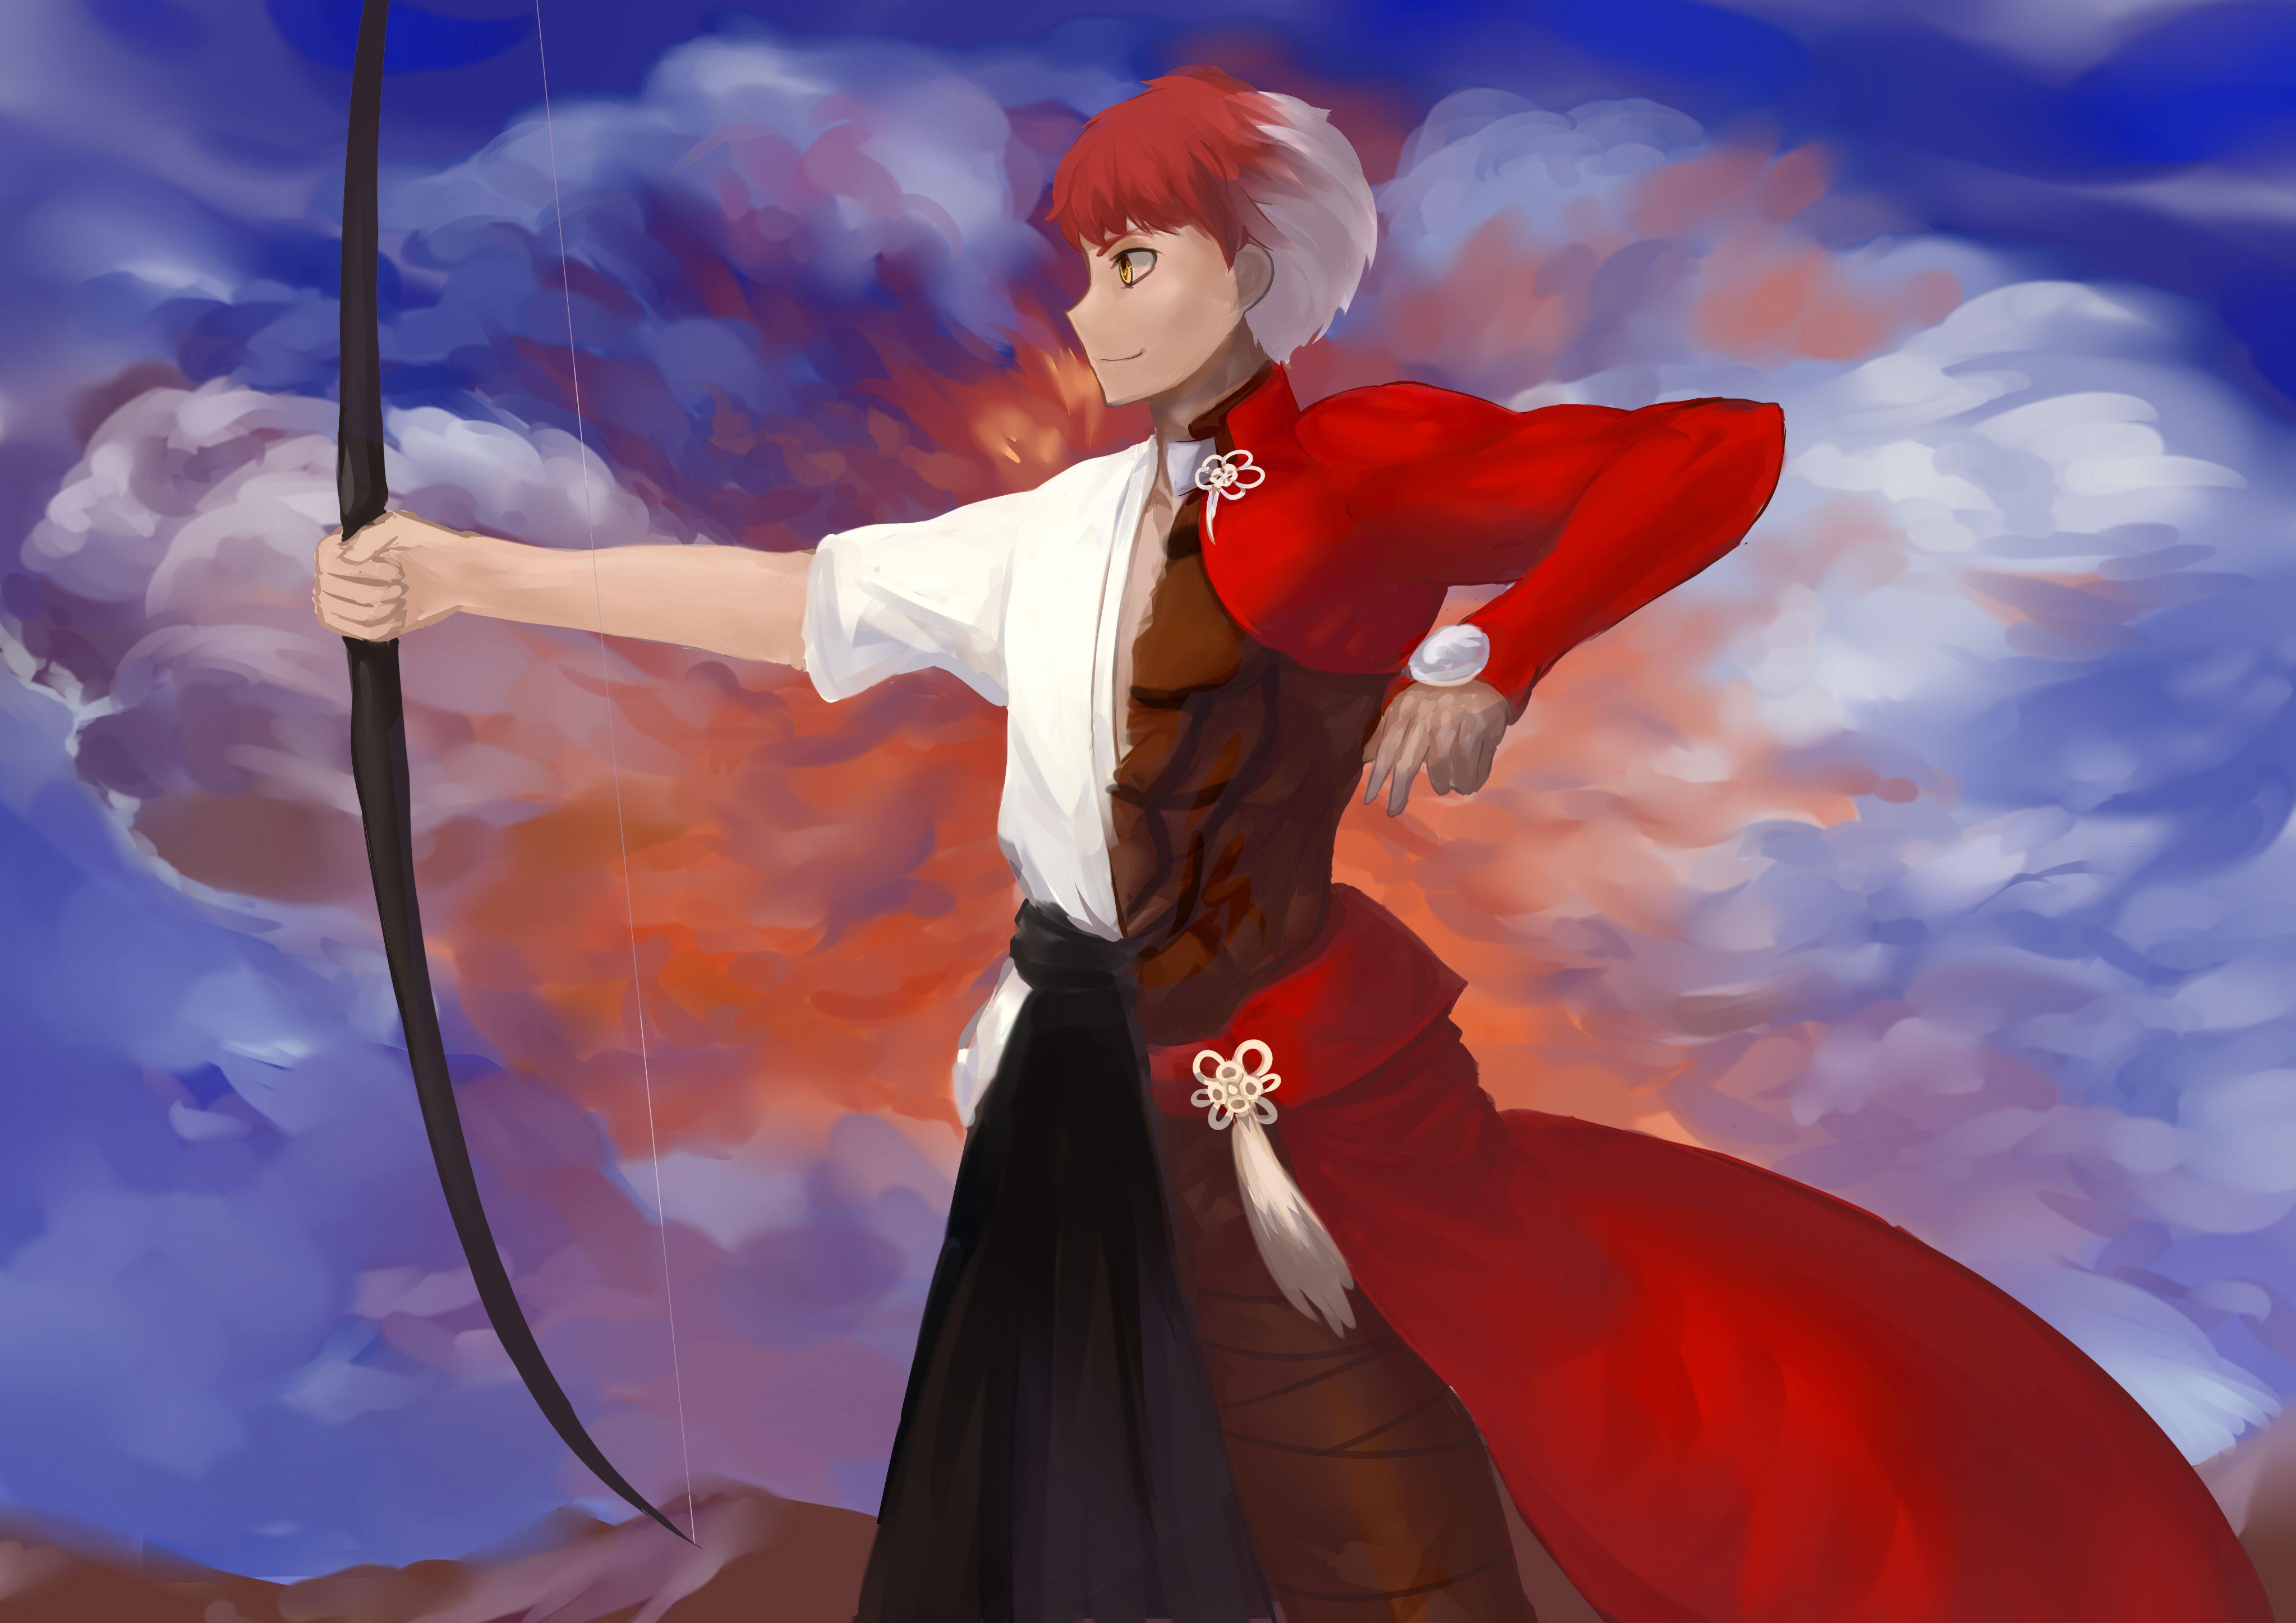 Shirou Emiya / Archer【Fate/Stay Night】 Fate stay night